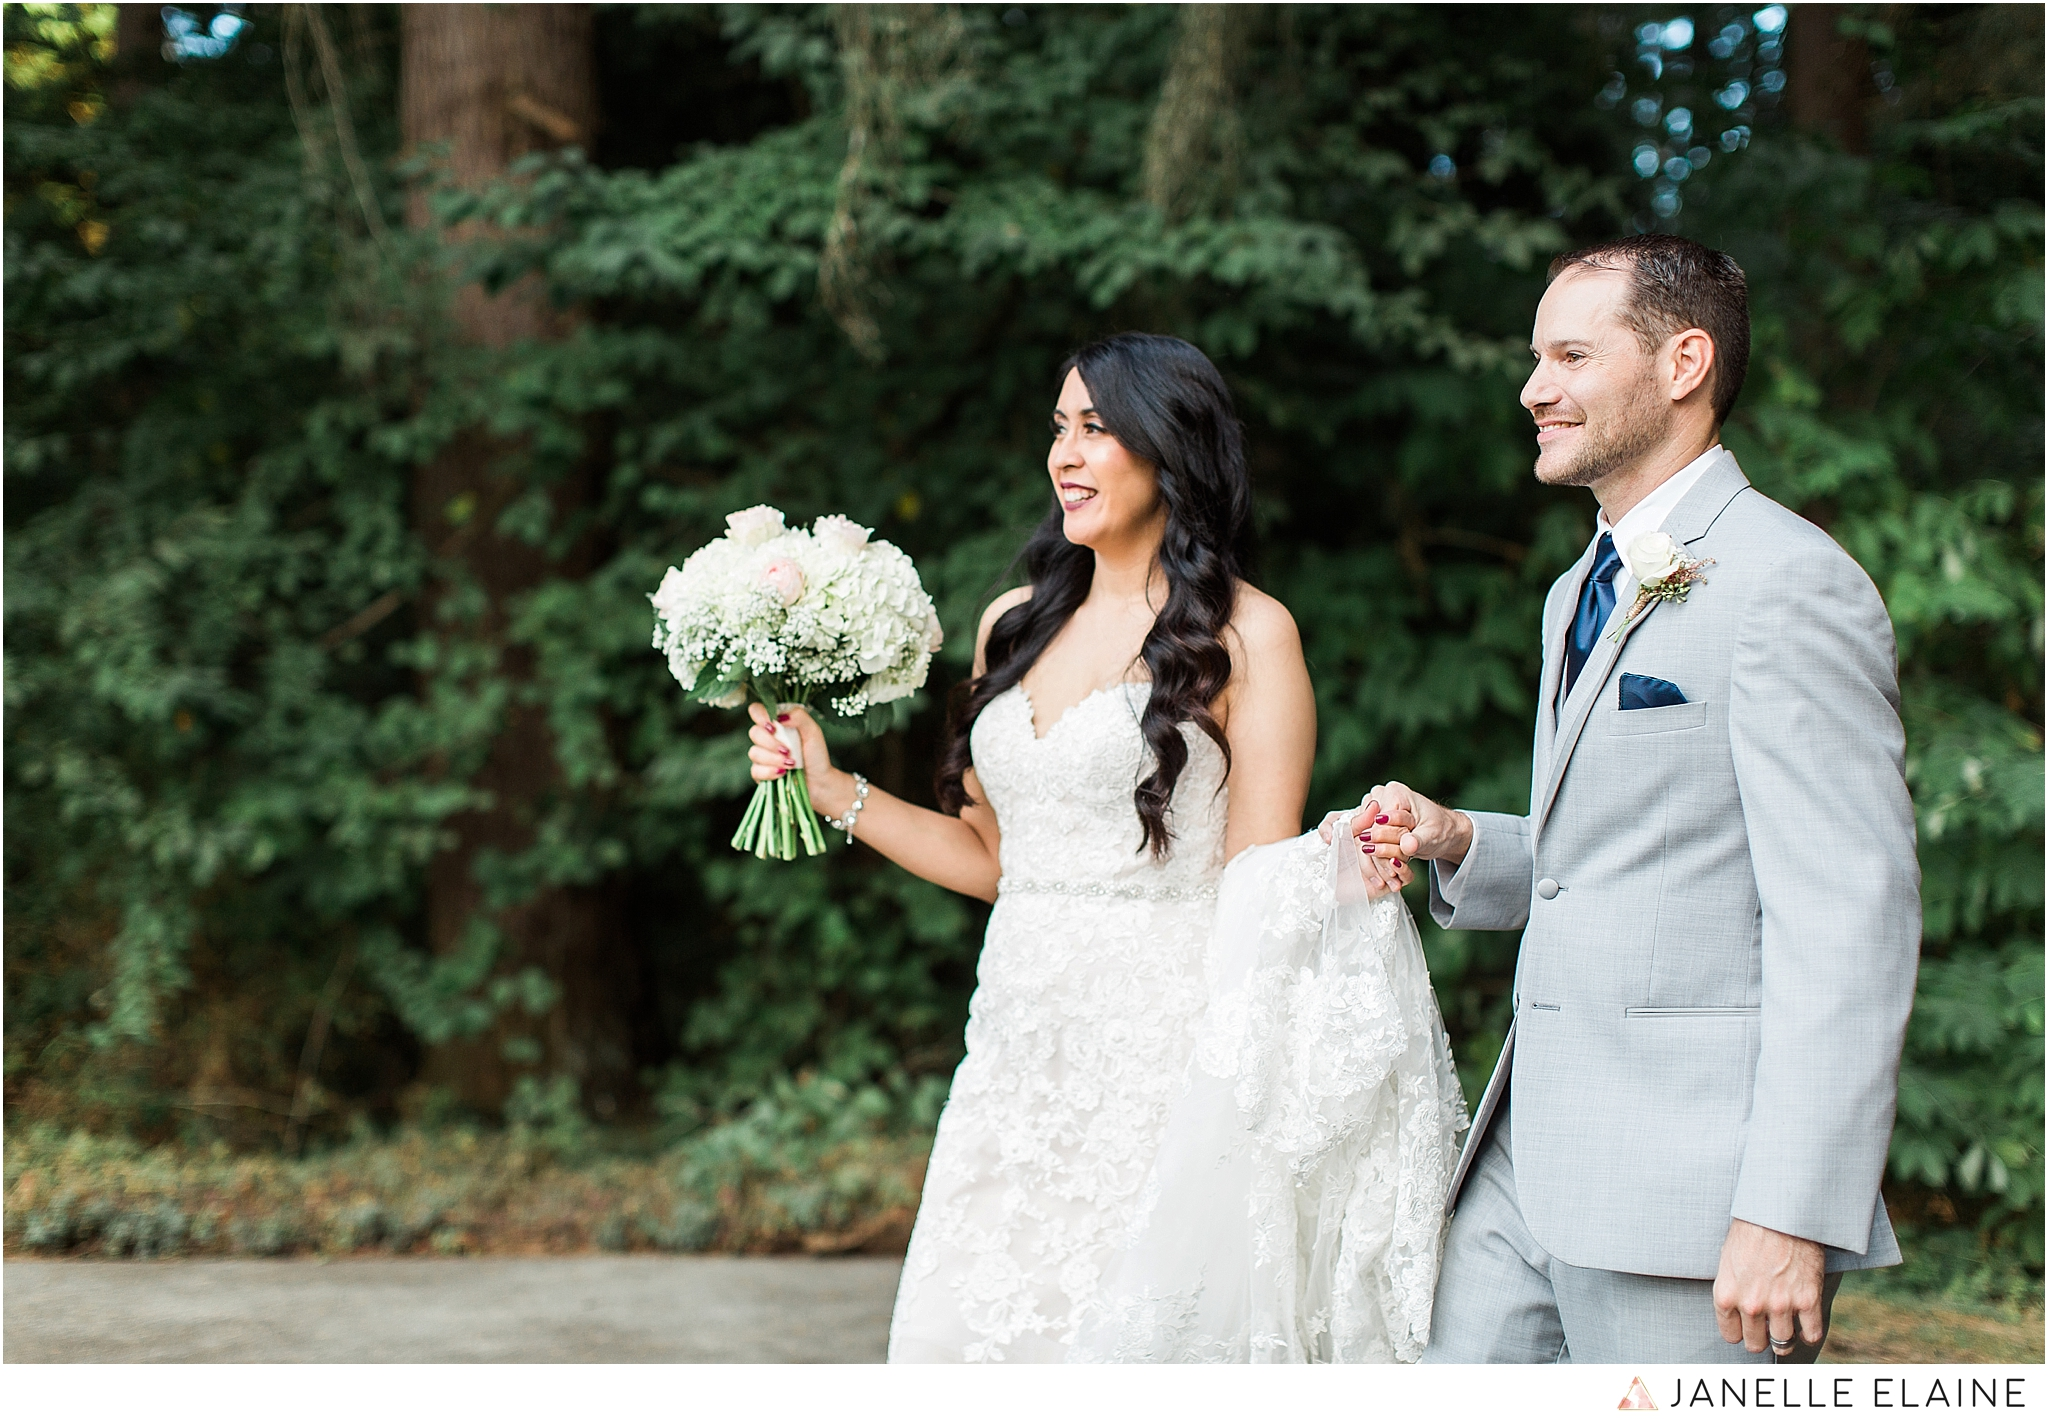 janelle elaine photography-professional wedding photographer-seattle-bellevue-robinswood house-206.jpg